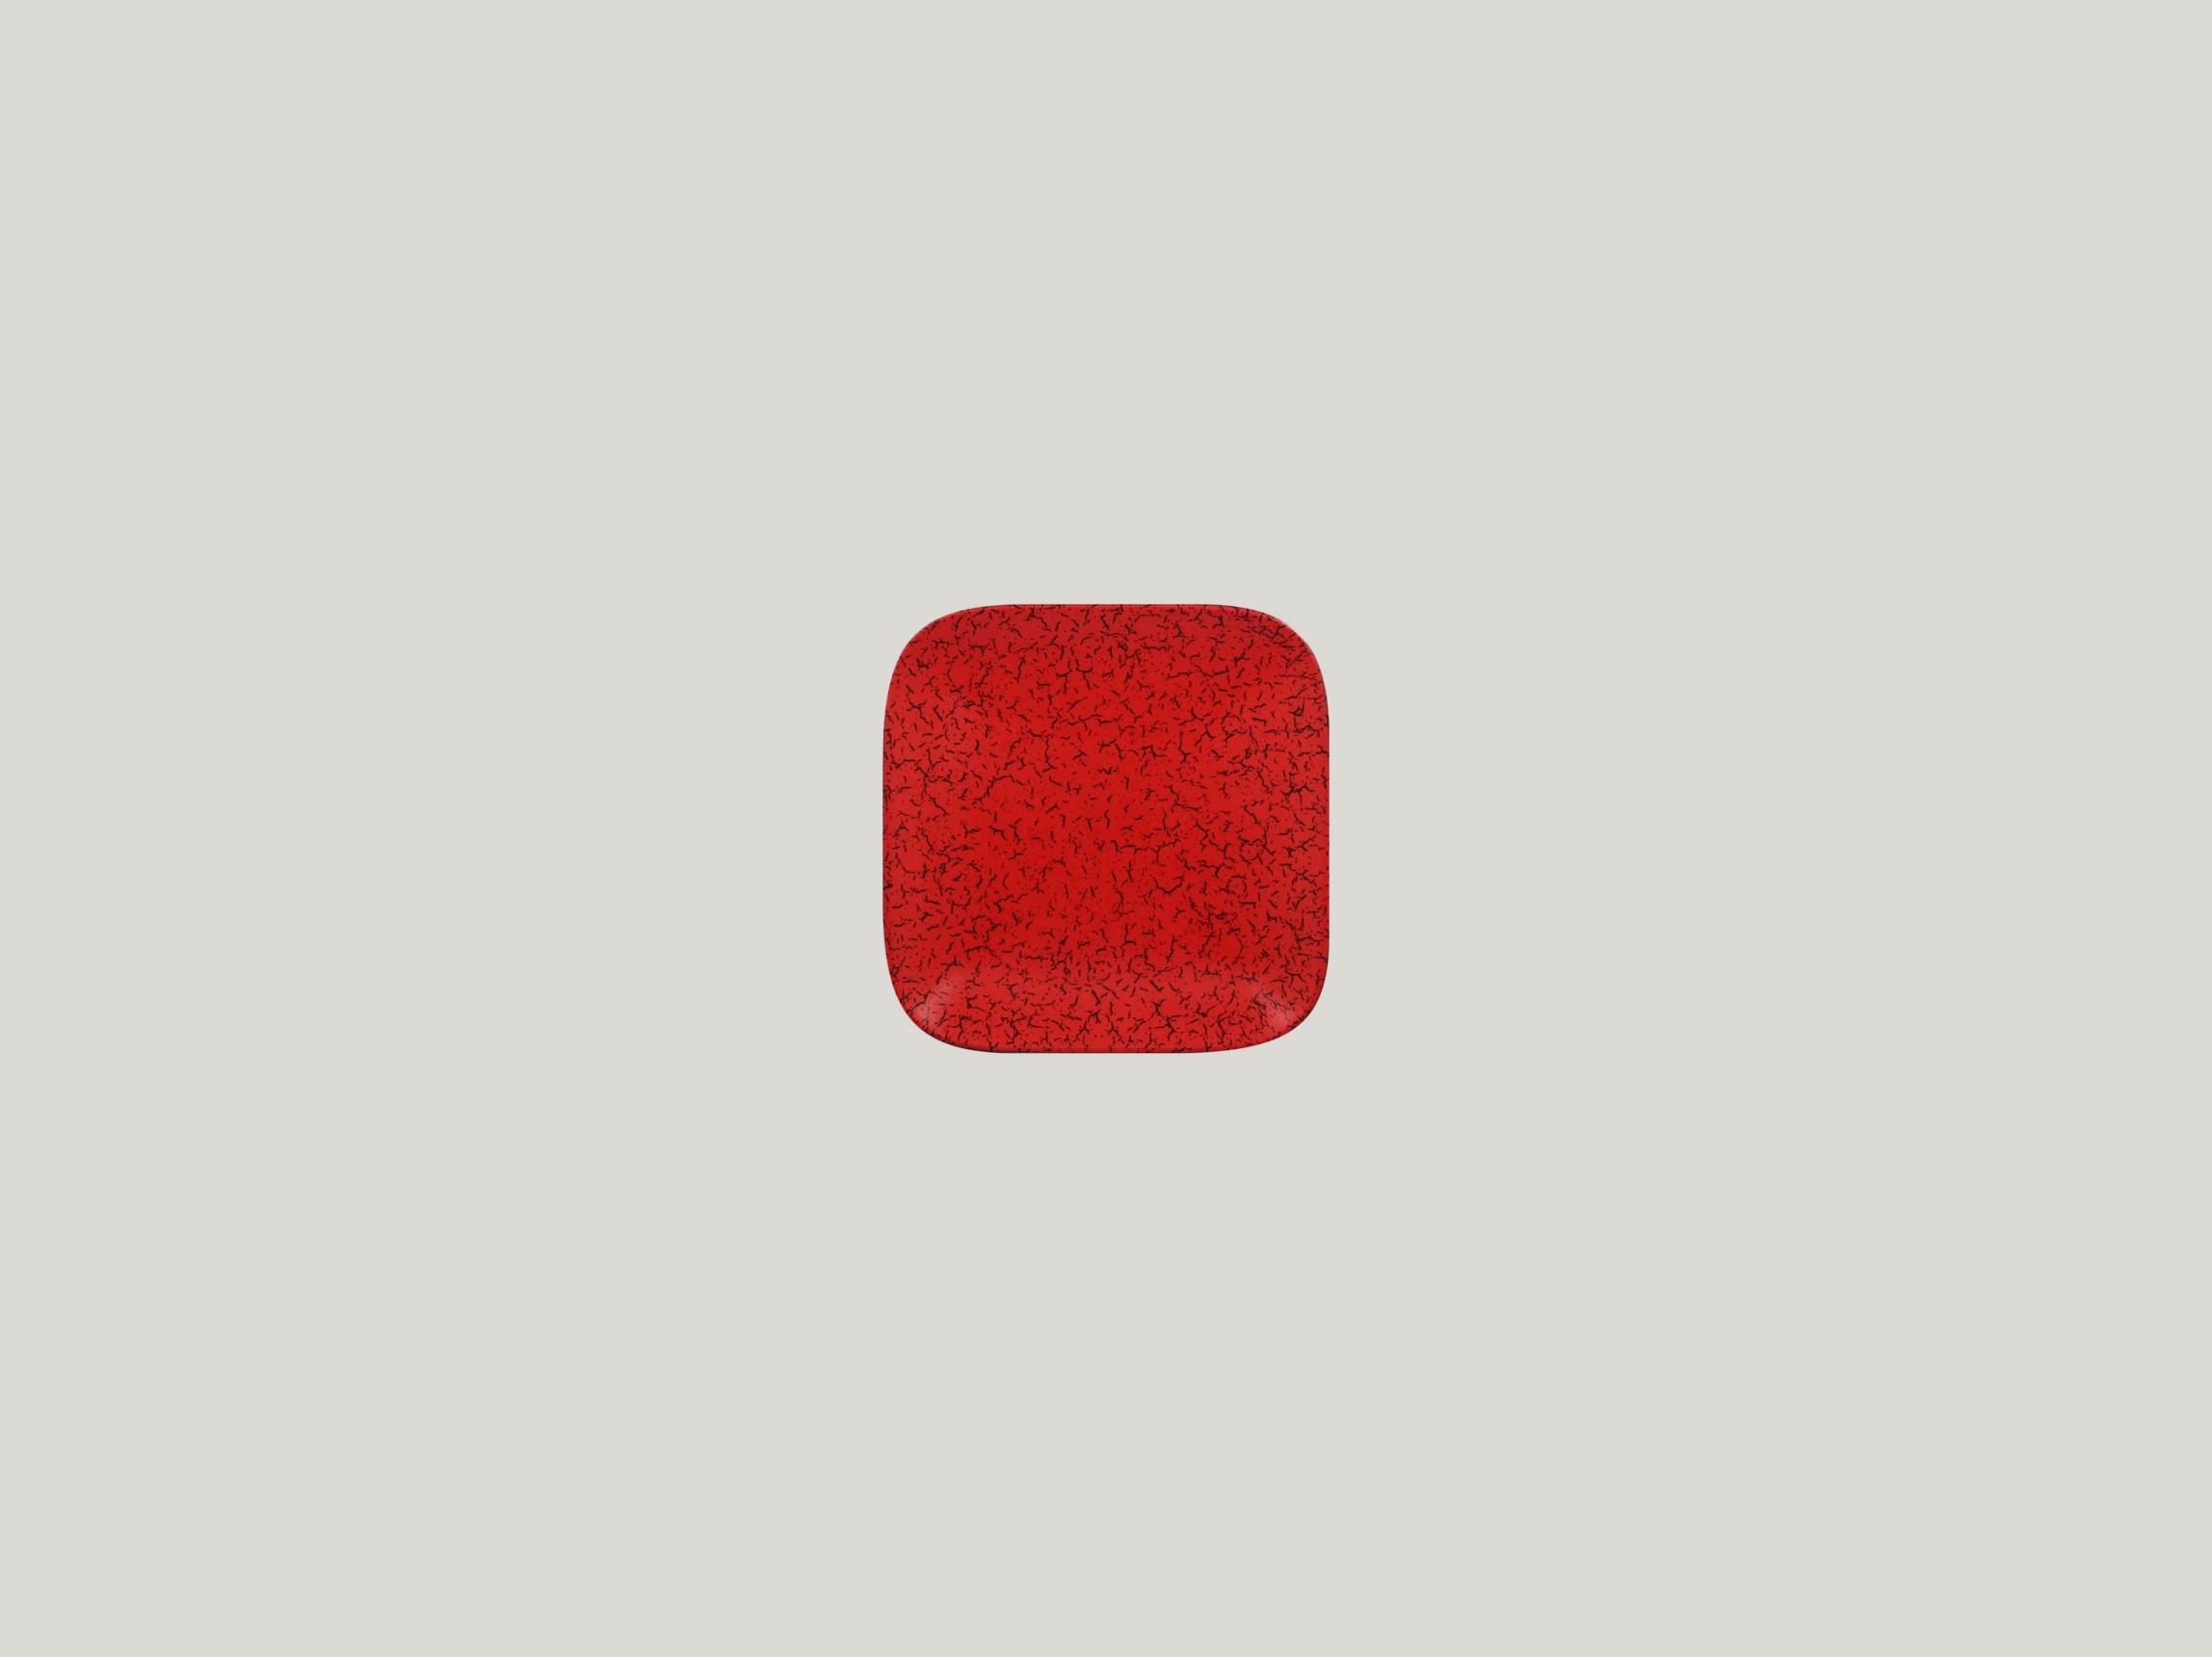 Talíř čtvercový 11 x 11 cm - červená